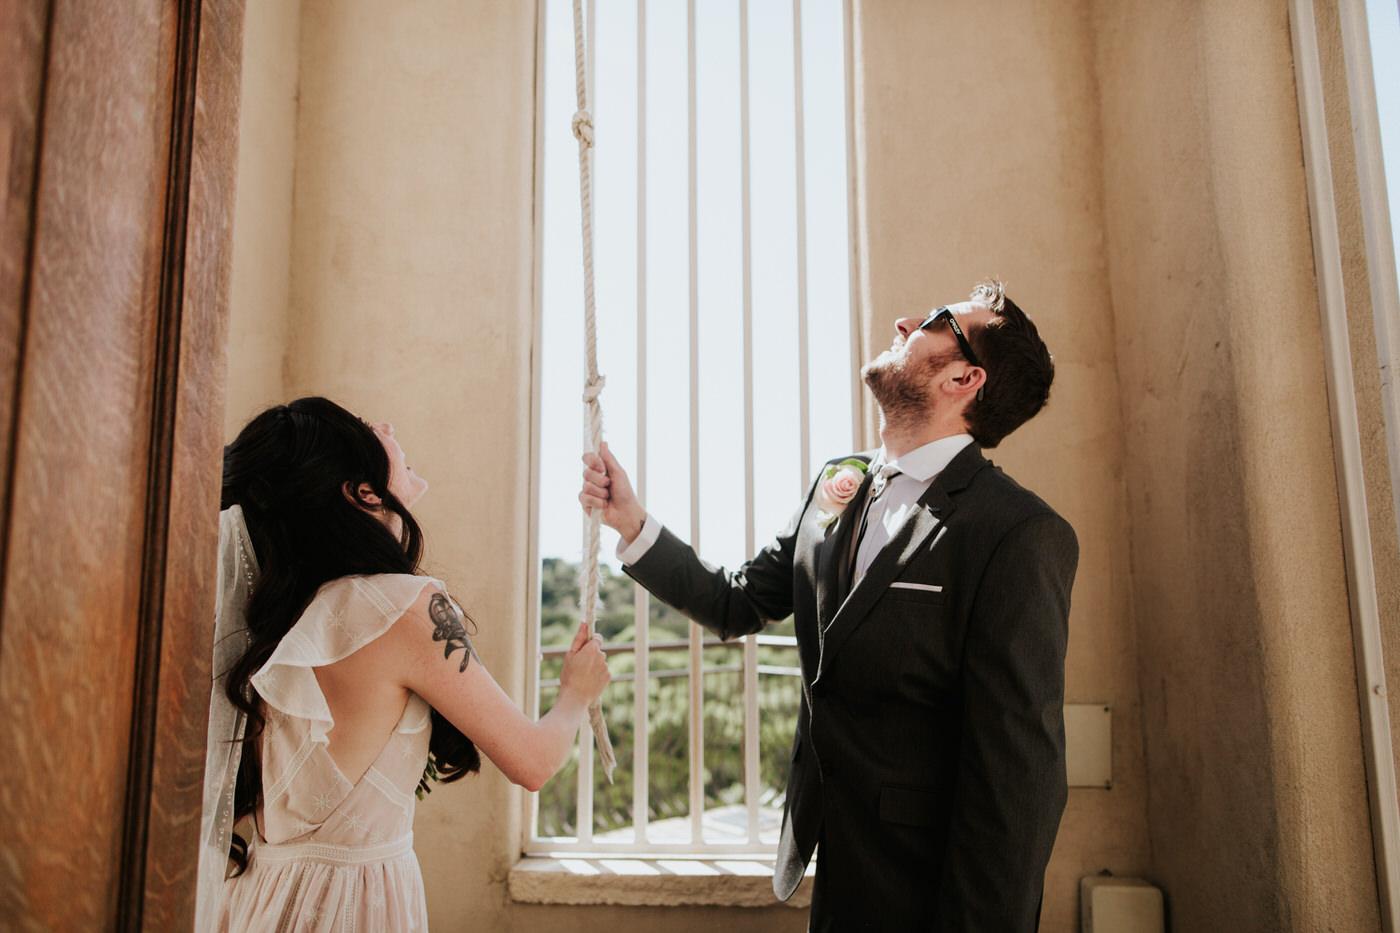 Chapel Dulcinea Vow Renewal Wedding - Diana Ascarrrunz Photography -164.jpg